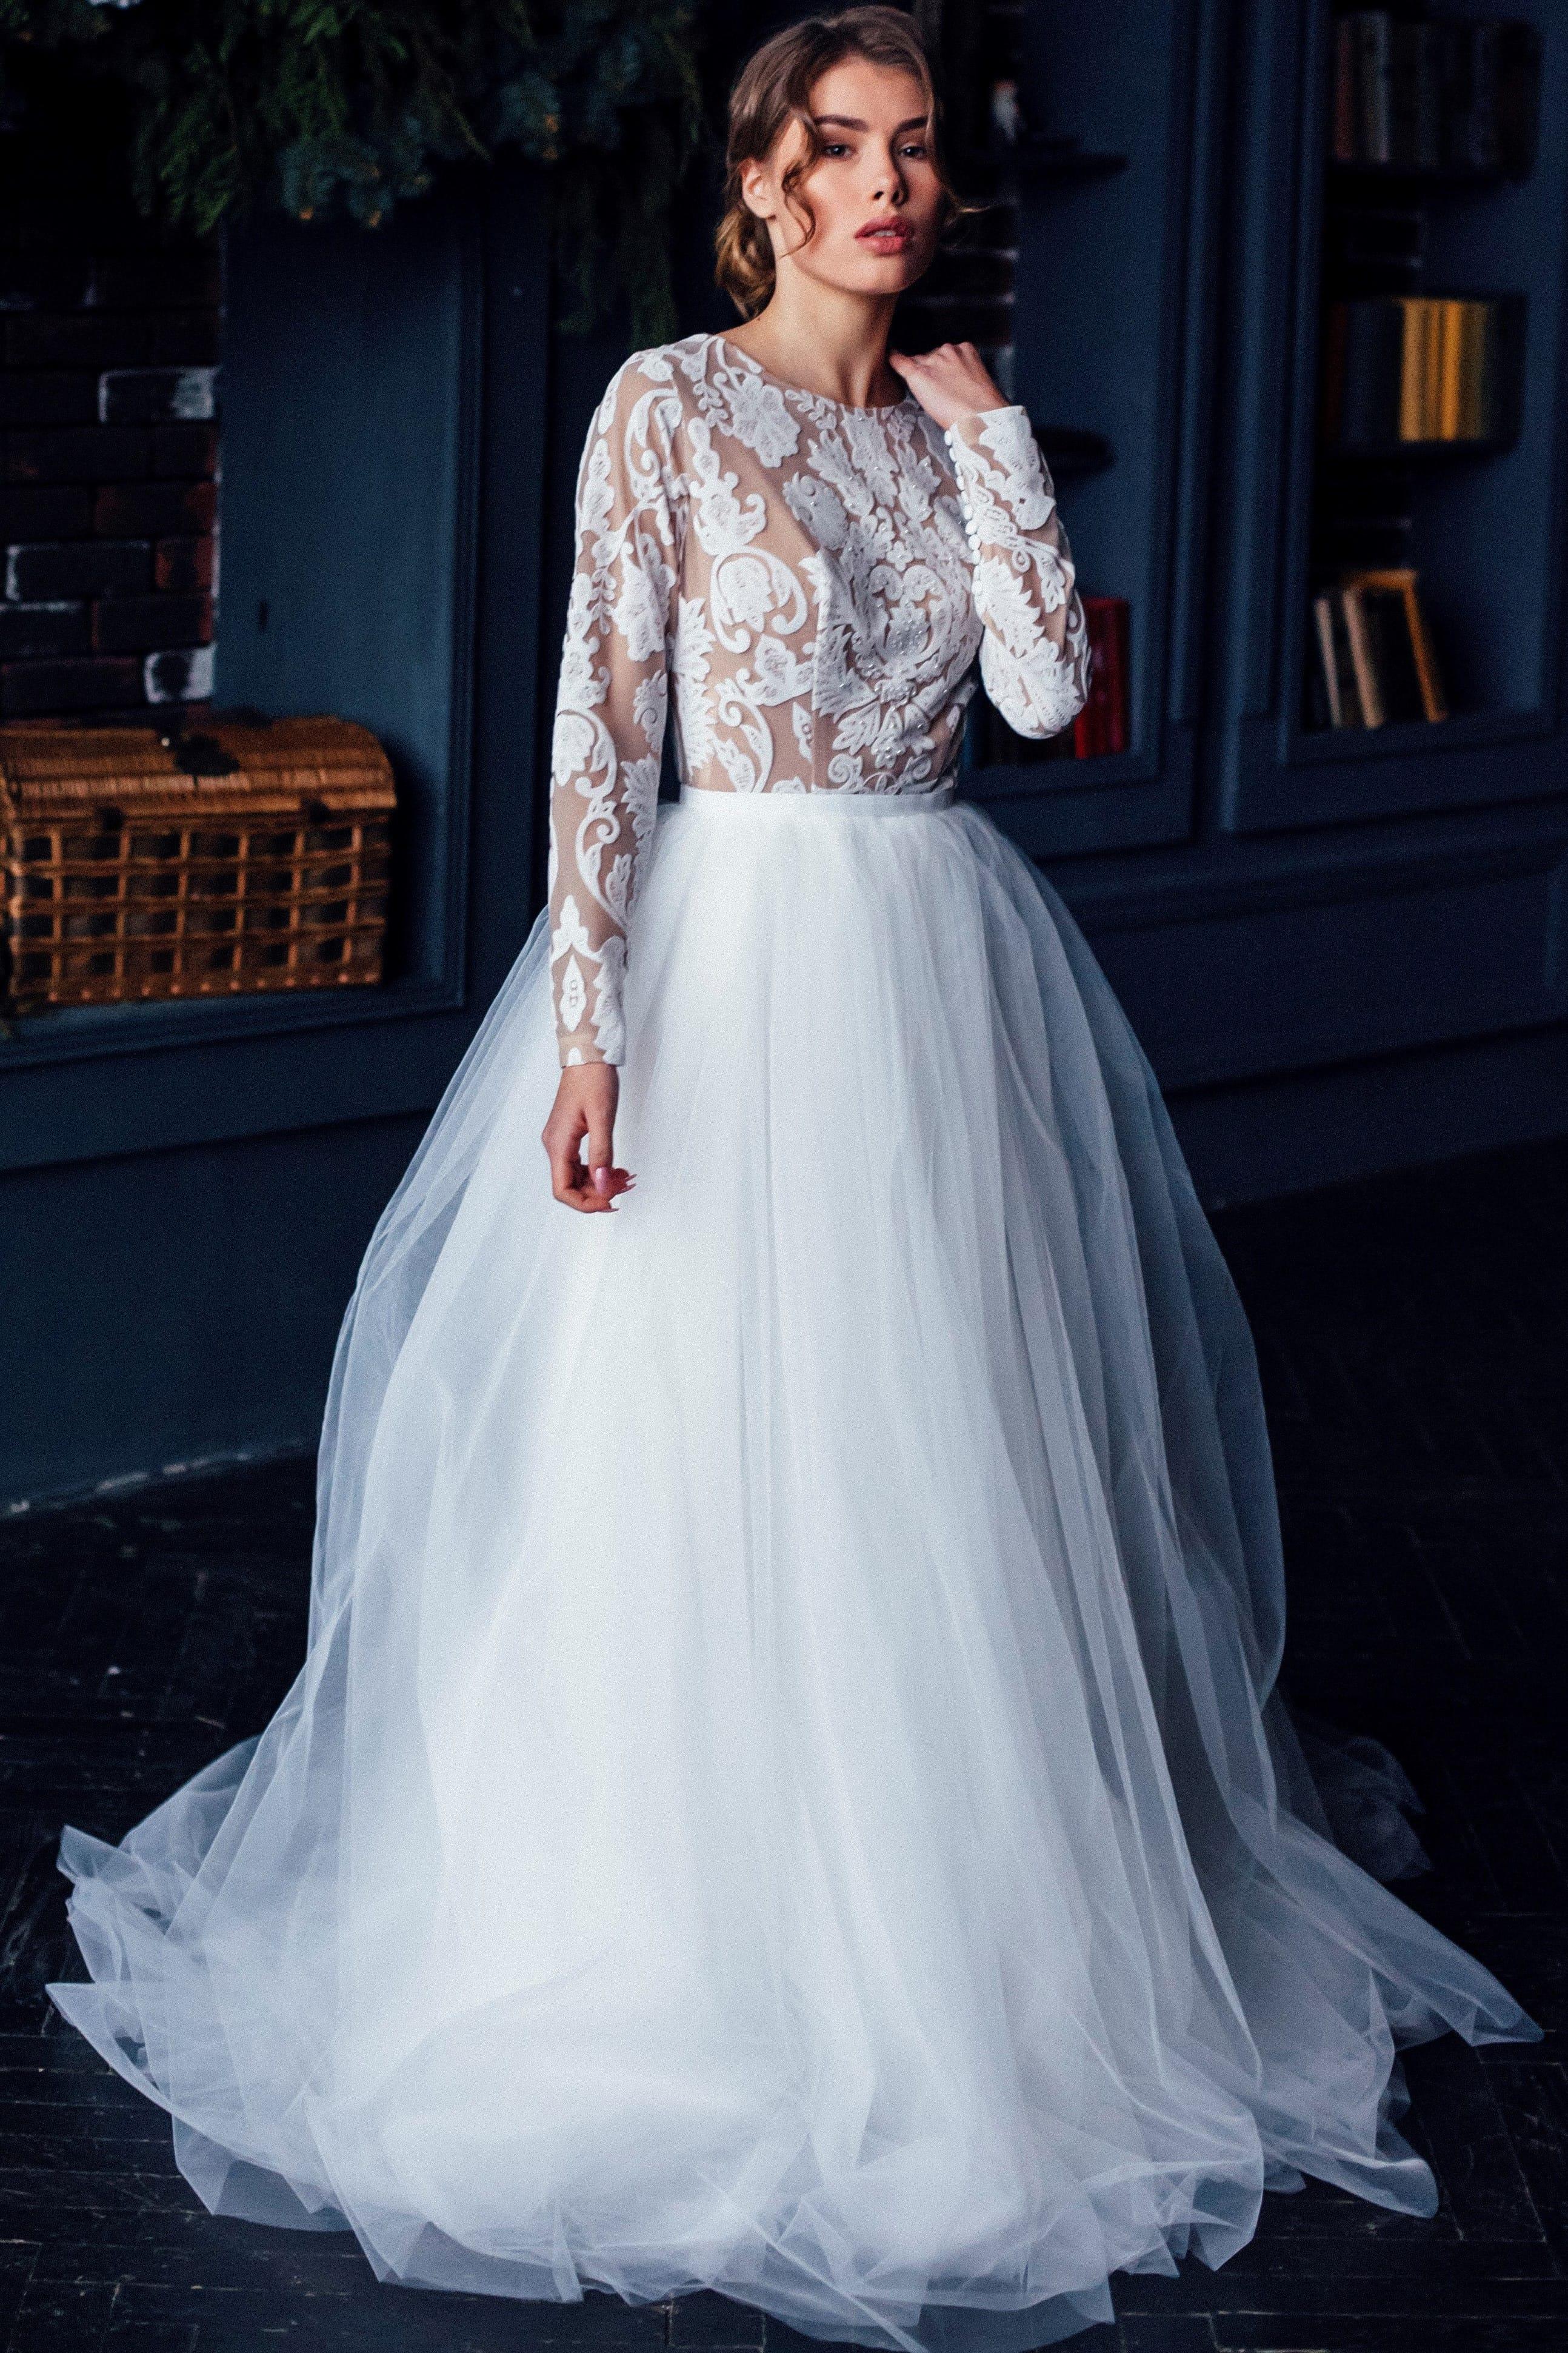 Свадебное платье MARGARET, коллекция THE ABSOLUTE LOVE, бренд RARE BRIDAL, фото 2